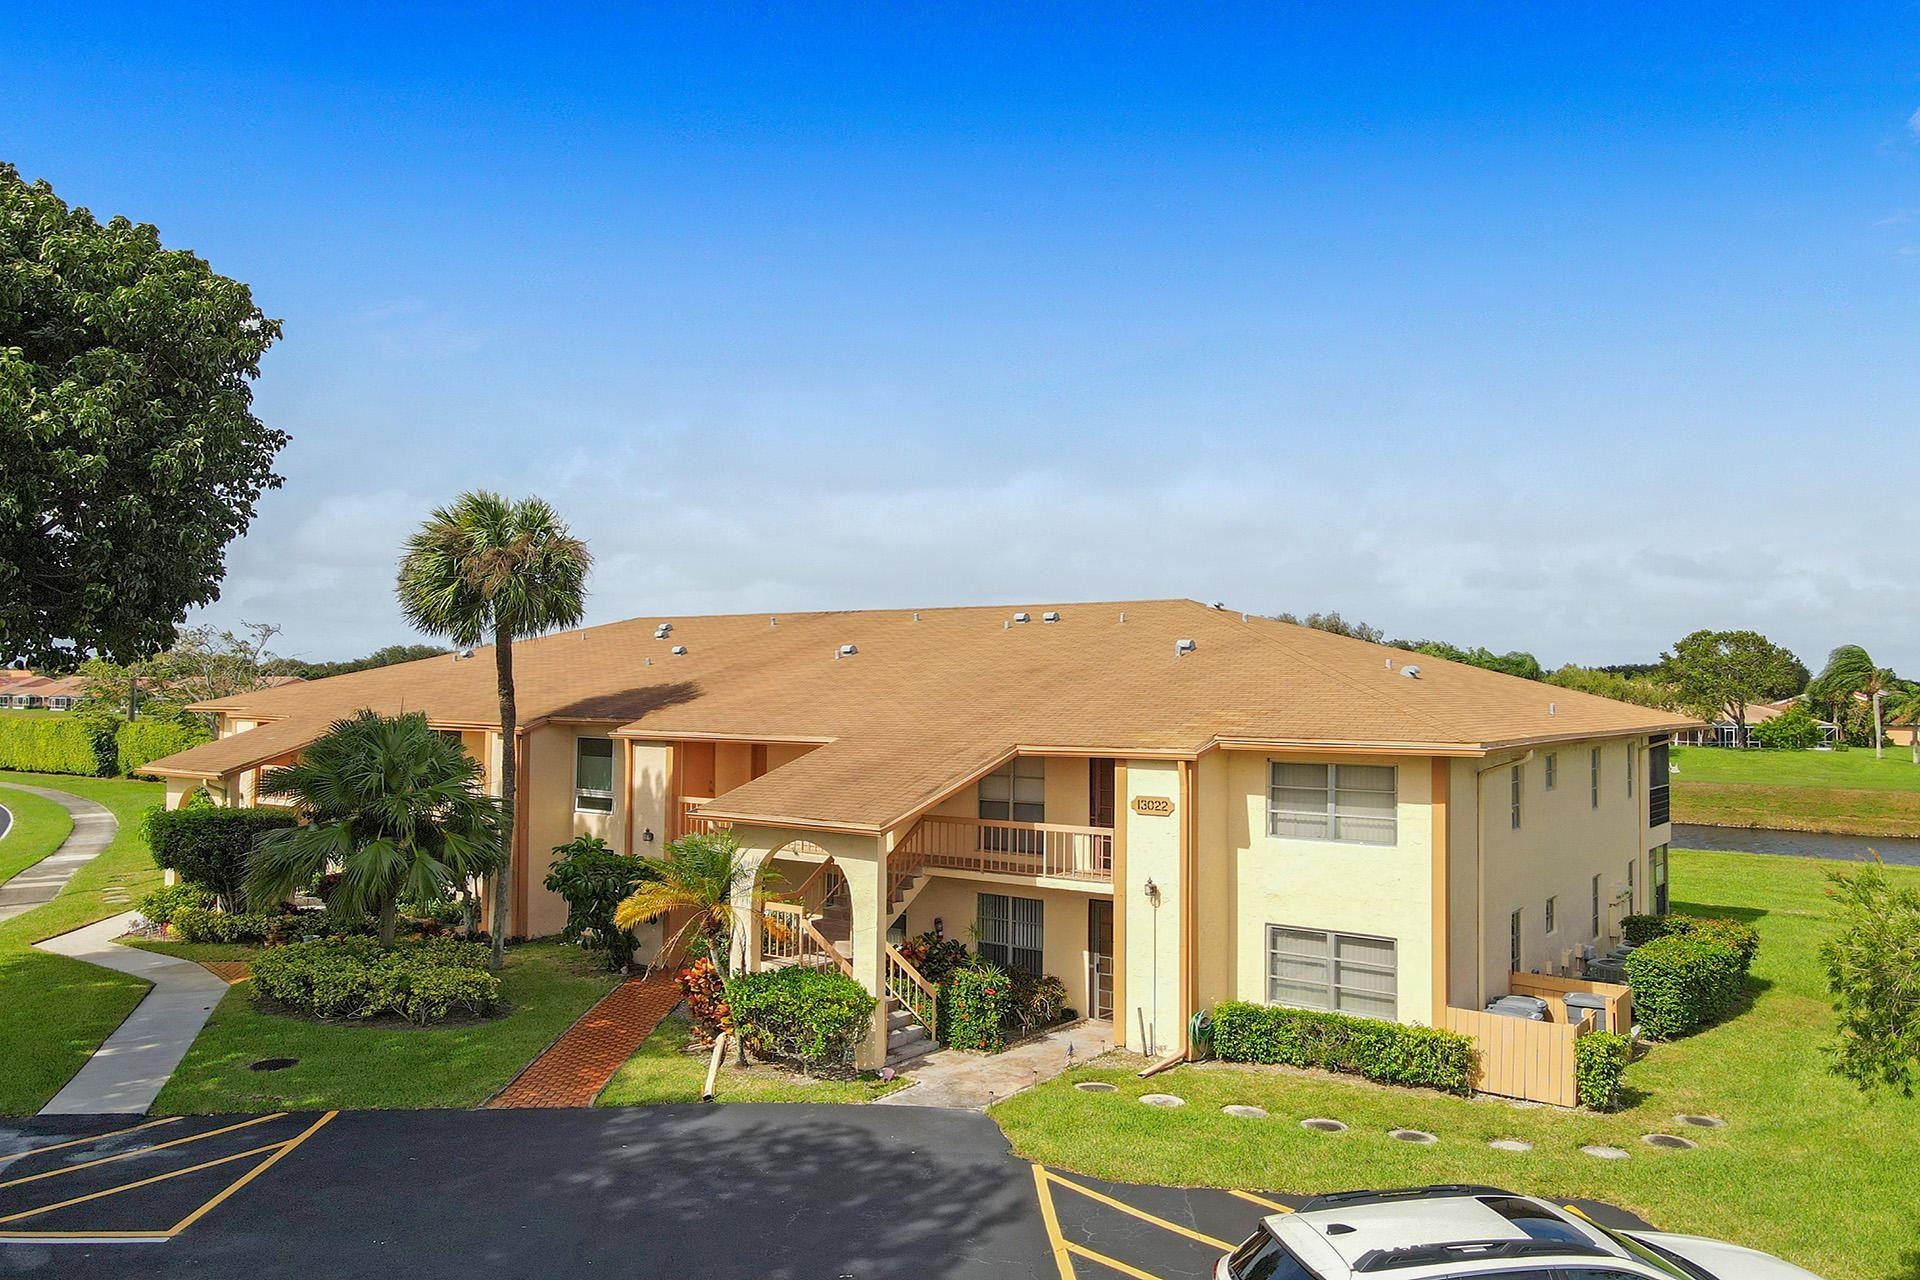 13022 Lady Palm Court #C, Delray Beach, FL 33484 - #: RX-10671519